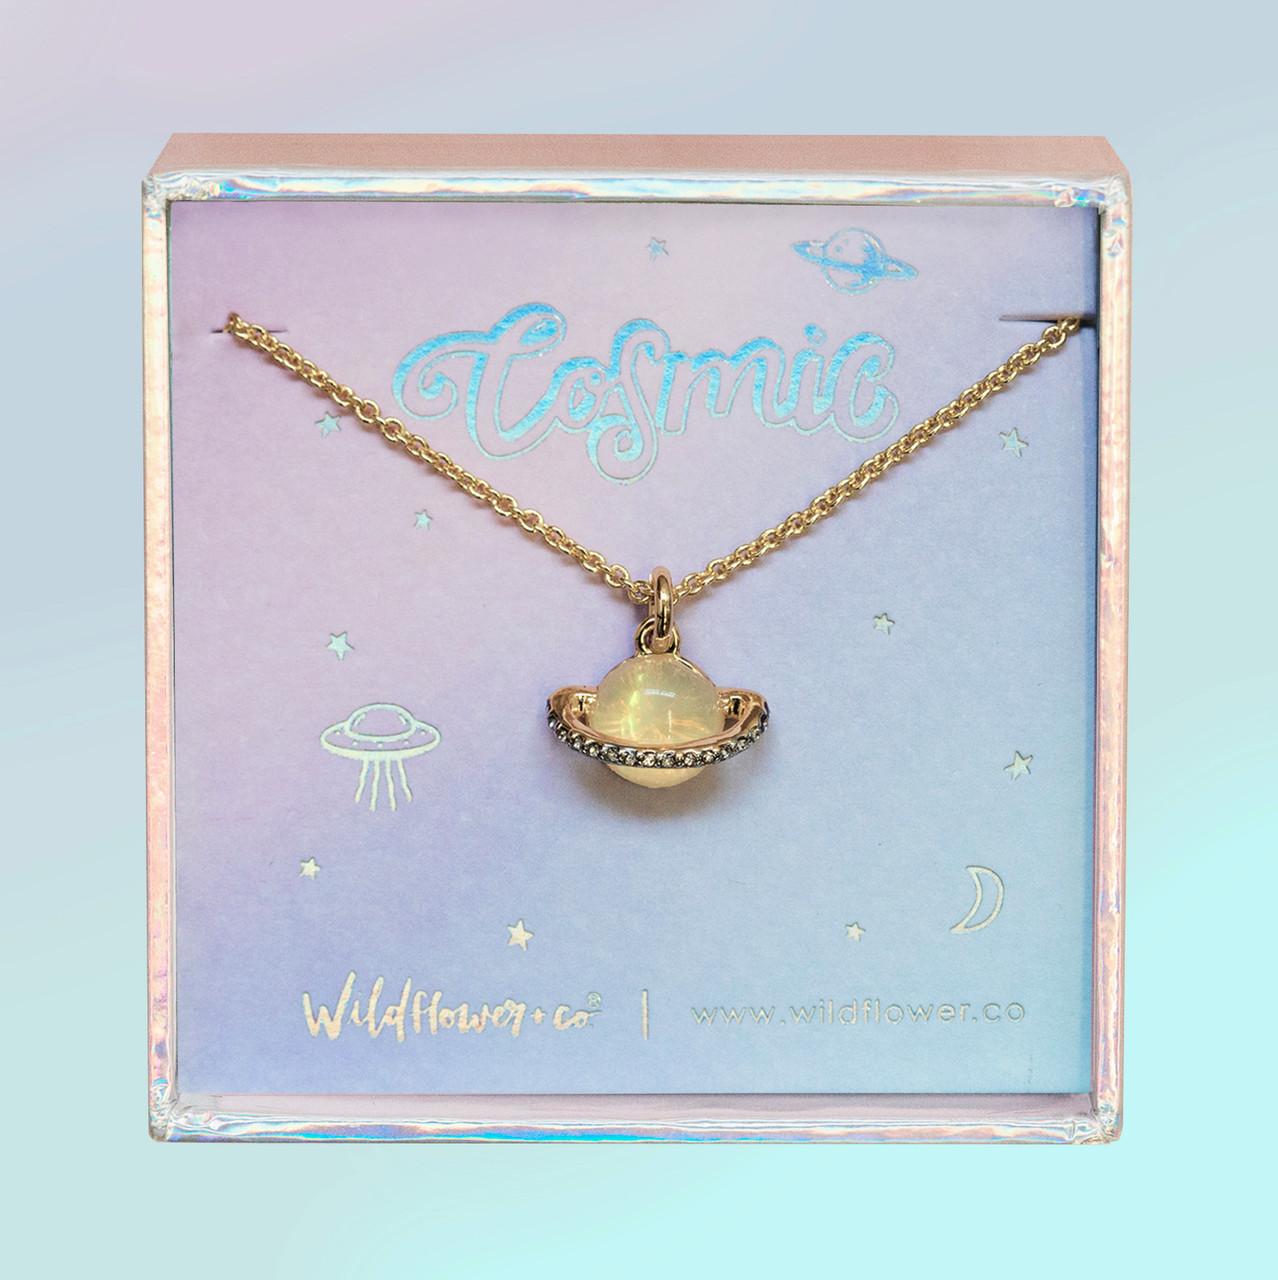 Crescent moon necklace Minimalistic necklace Moon necklace cosmic jewelry Planet necklace